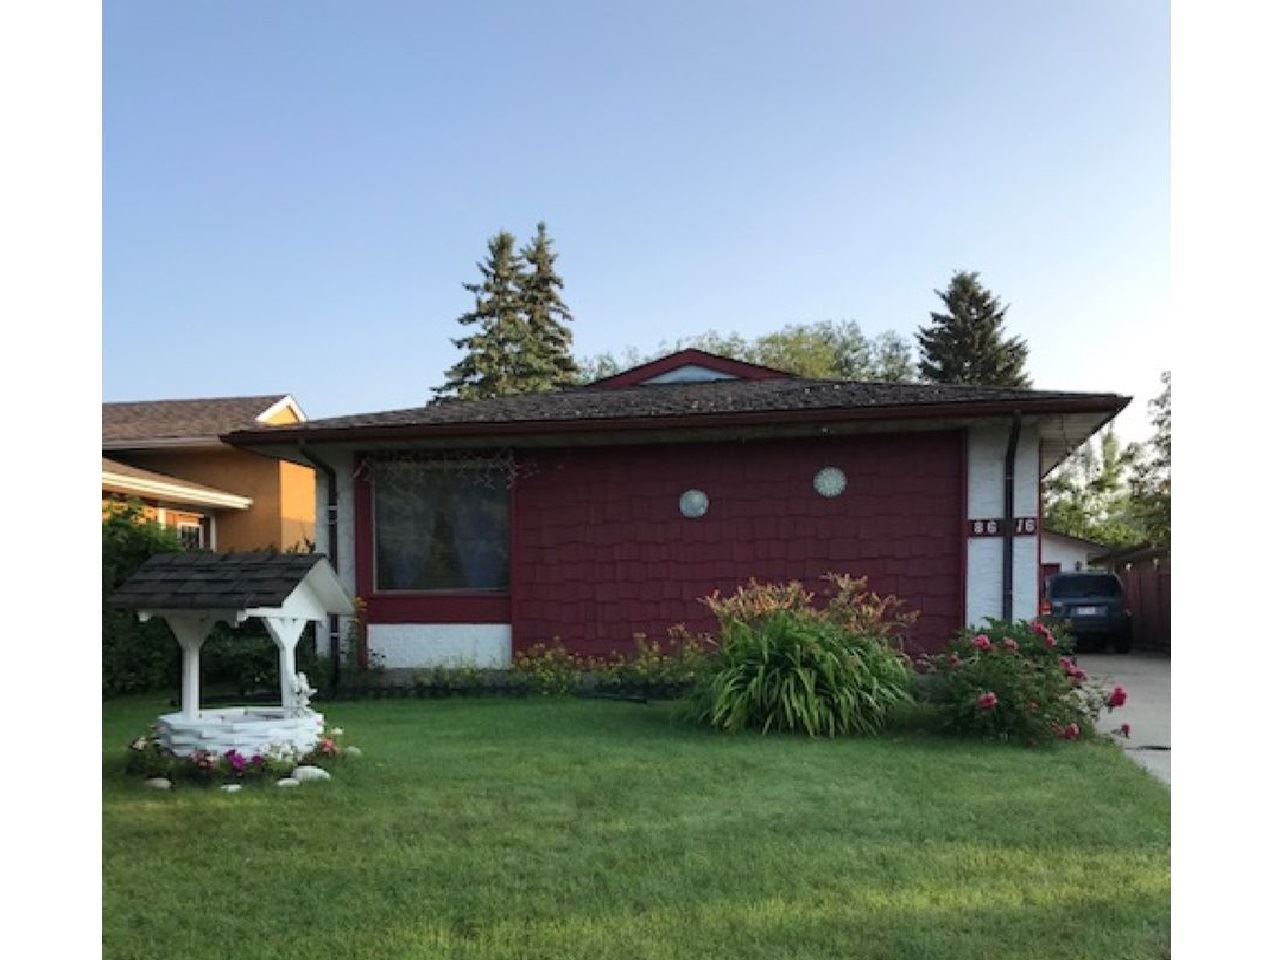 Main Photo: 8616 25A Avenue in Edmonton: Zone 29 House for sale : MLS®# E4168571